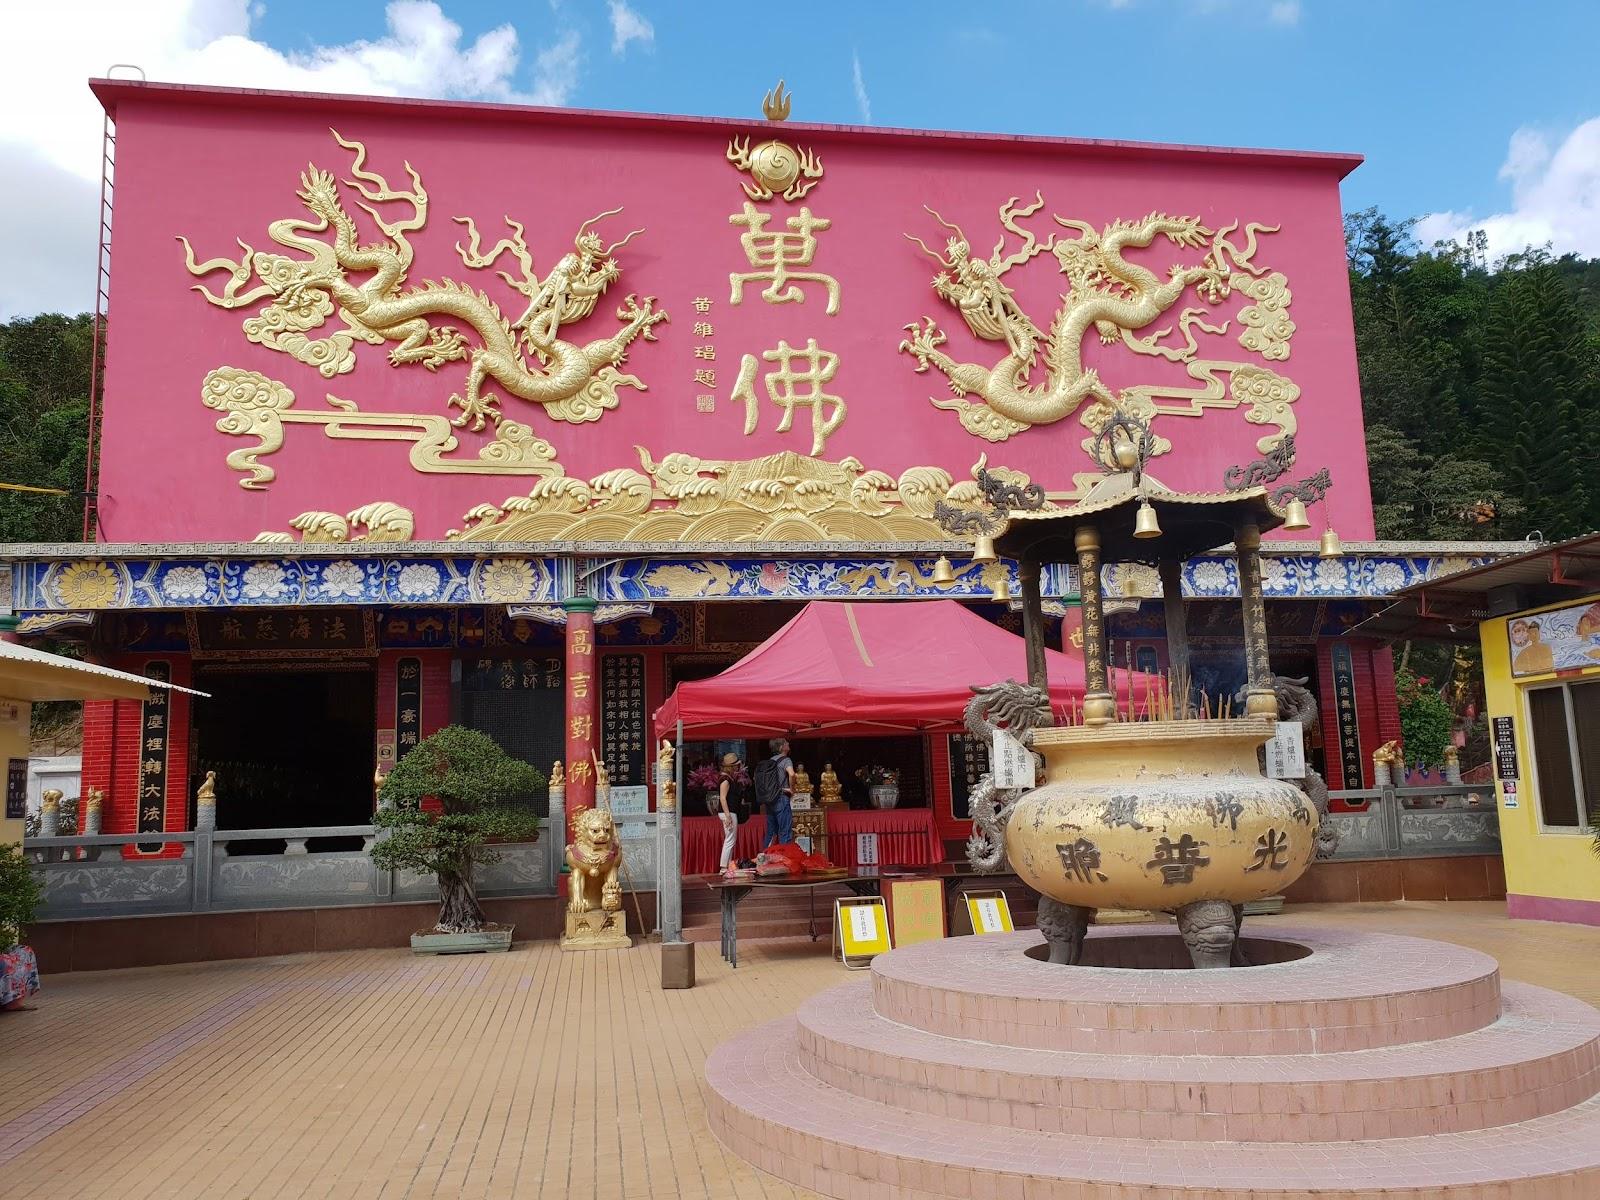 The 10000 Buddhas Hall